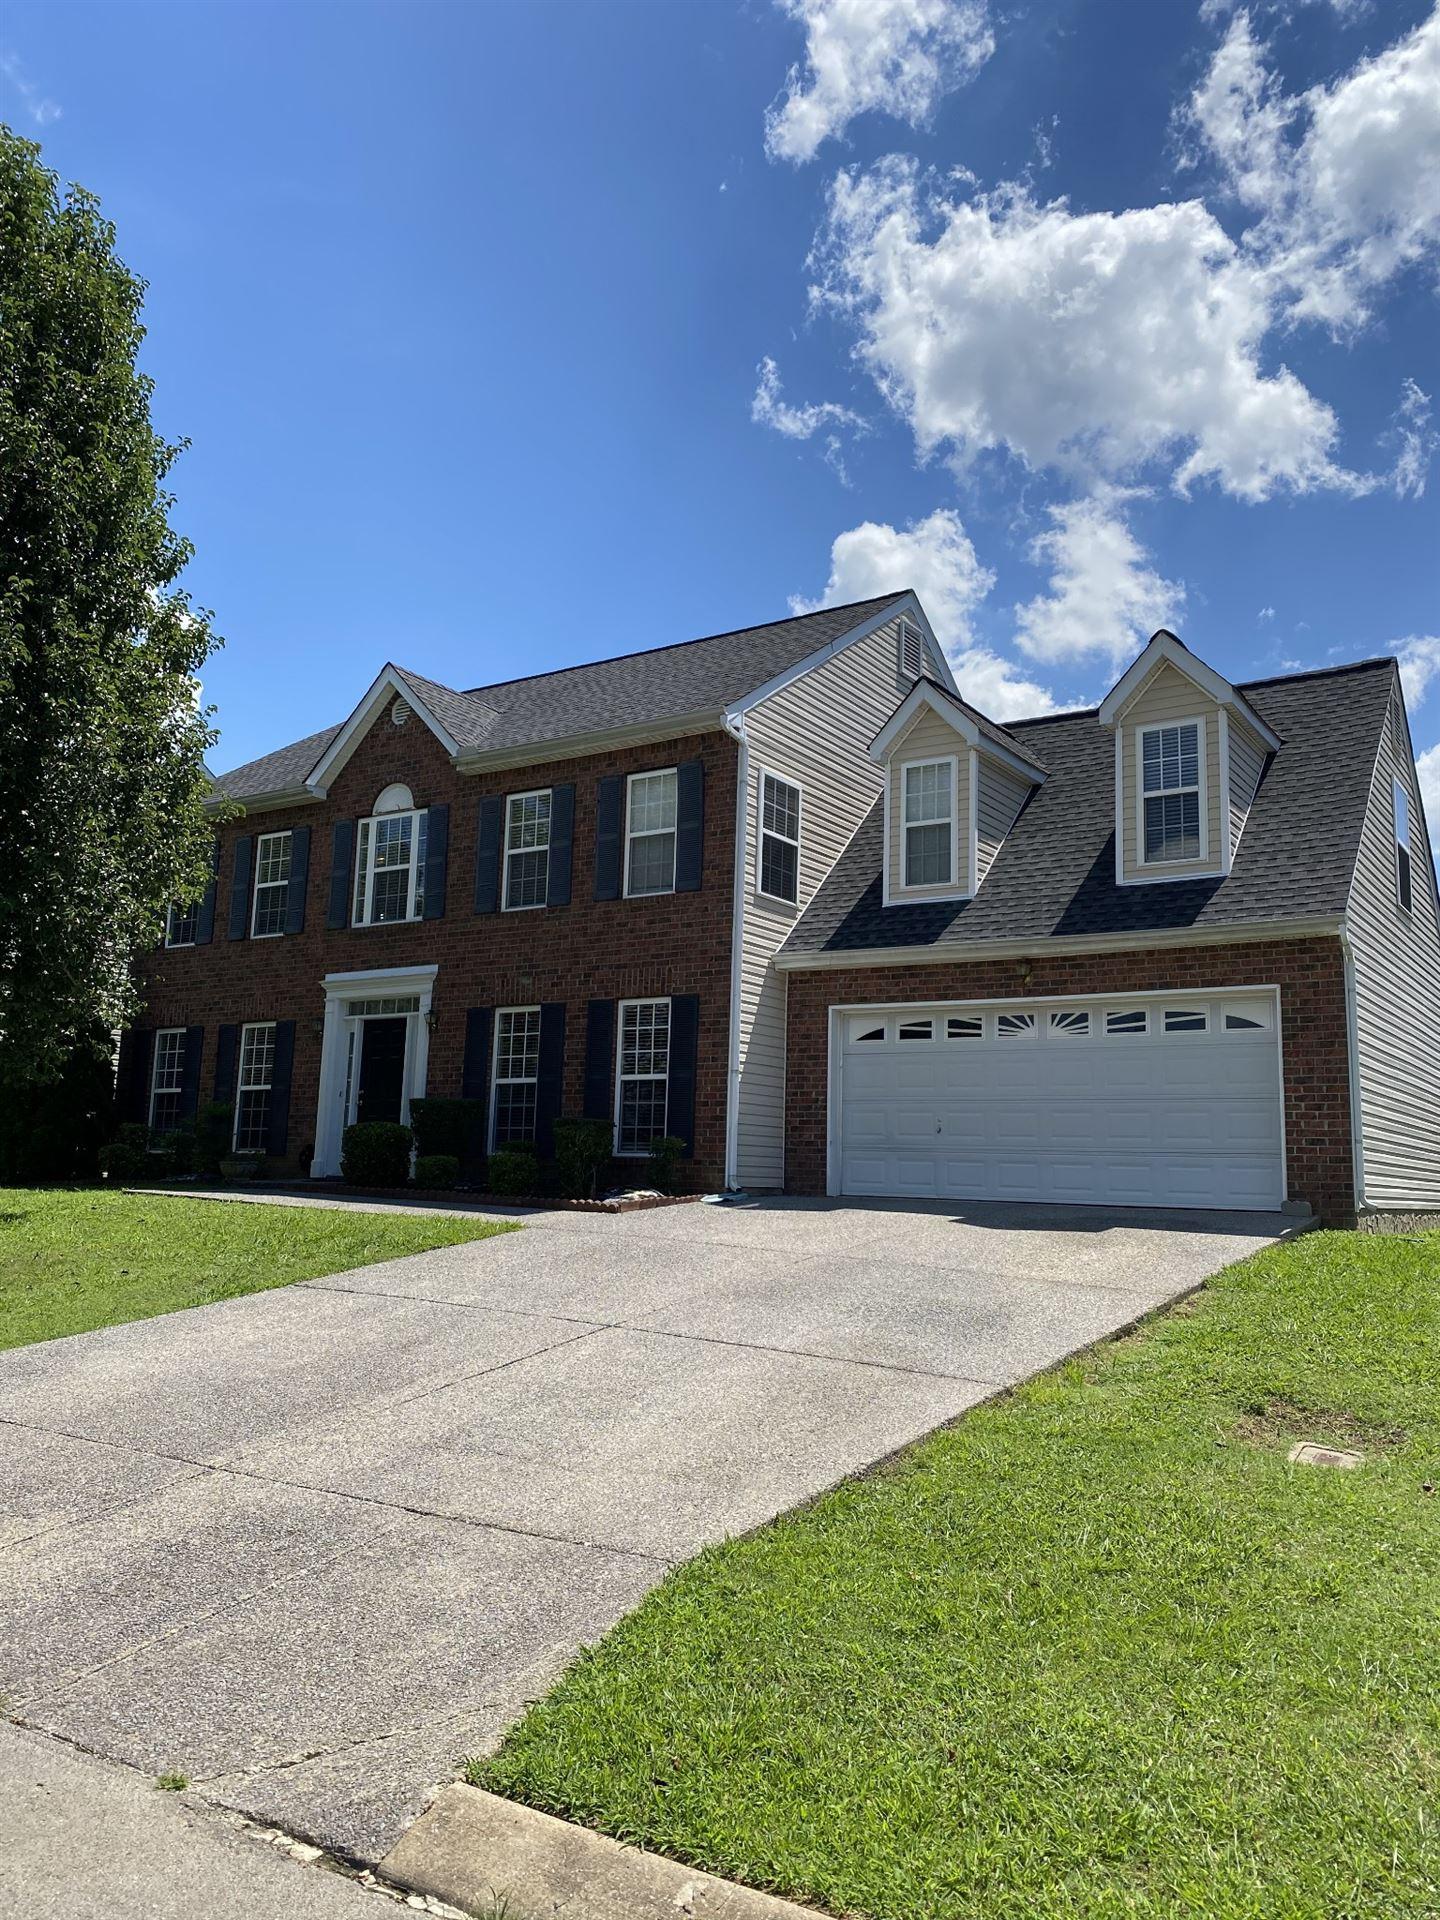 Photo of 1417 Weston Ln, Spring Hill, TN 37174 (MLS # 2169909)